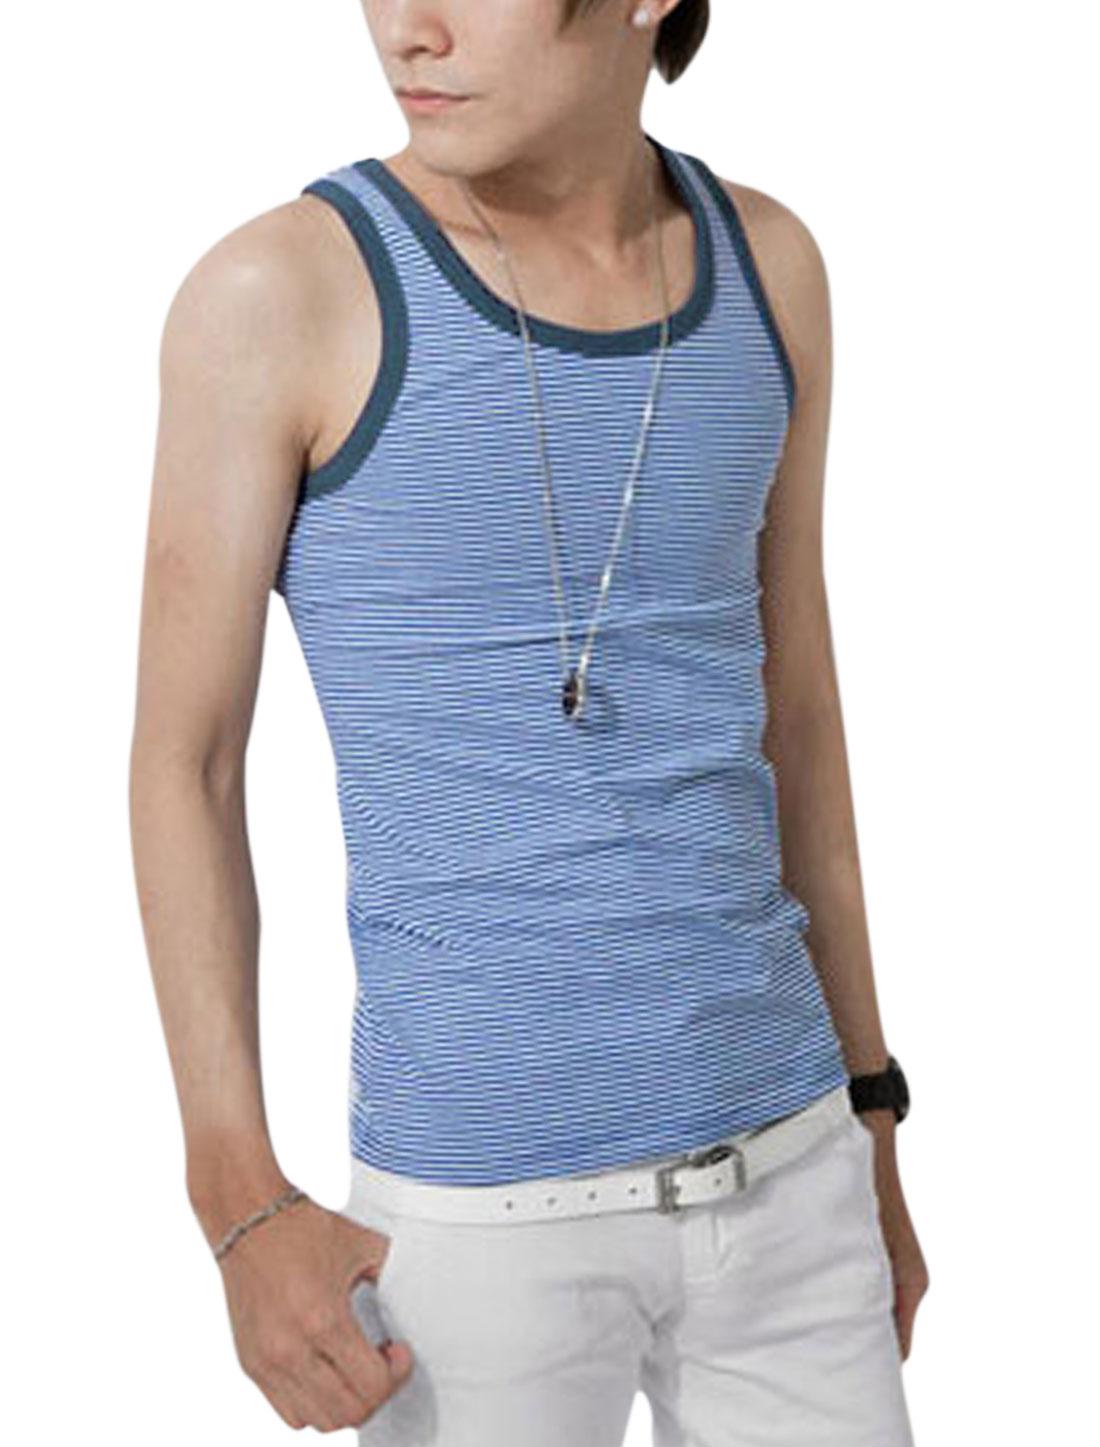 Men's Stripes Print Summer Fit Tank Top Blue White S